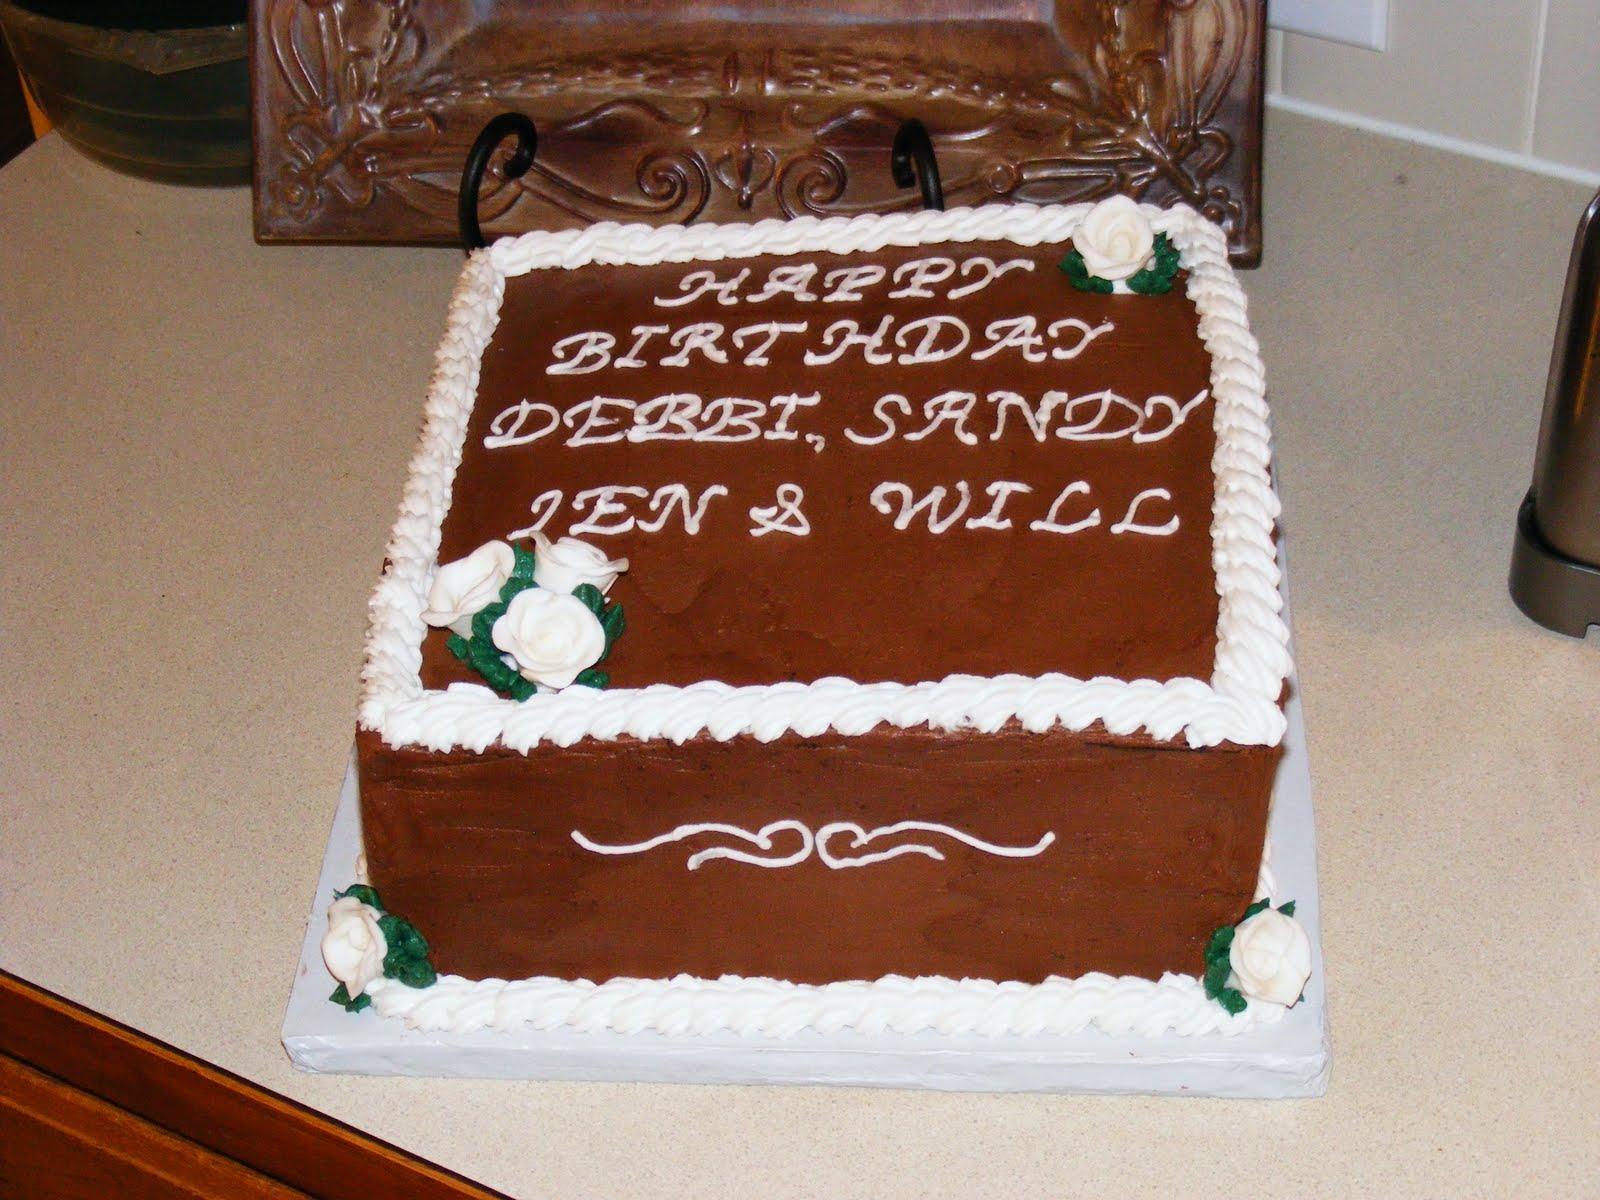 Birthday Cake Images Square : PattiCakes!: Square Birthday Cake